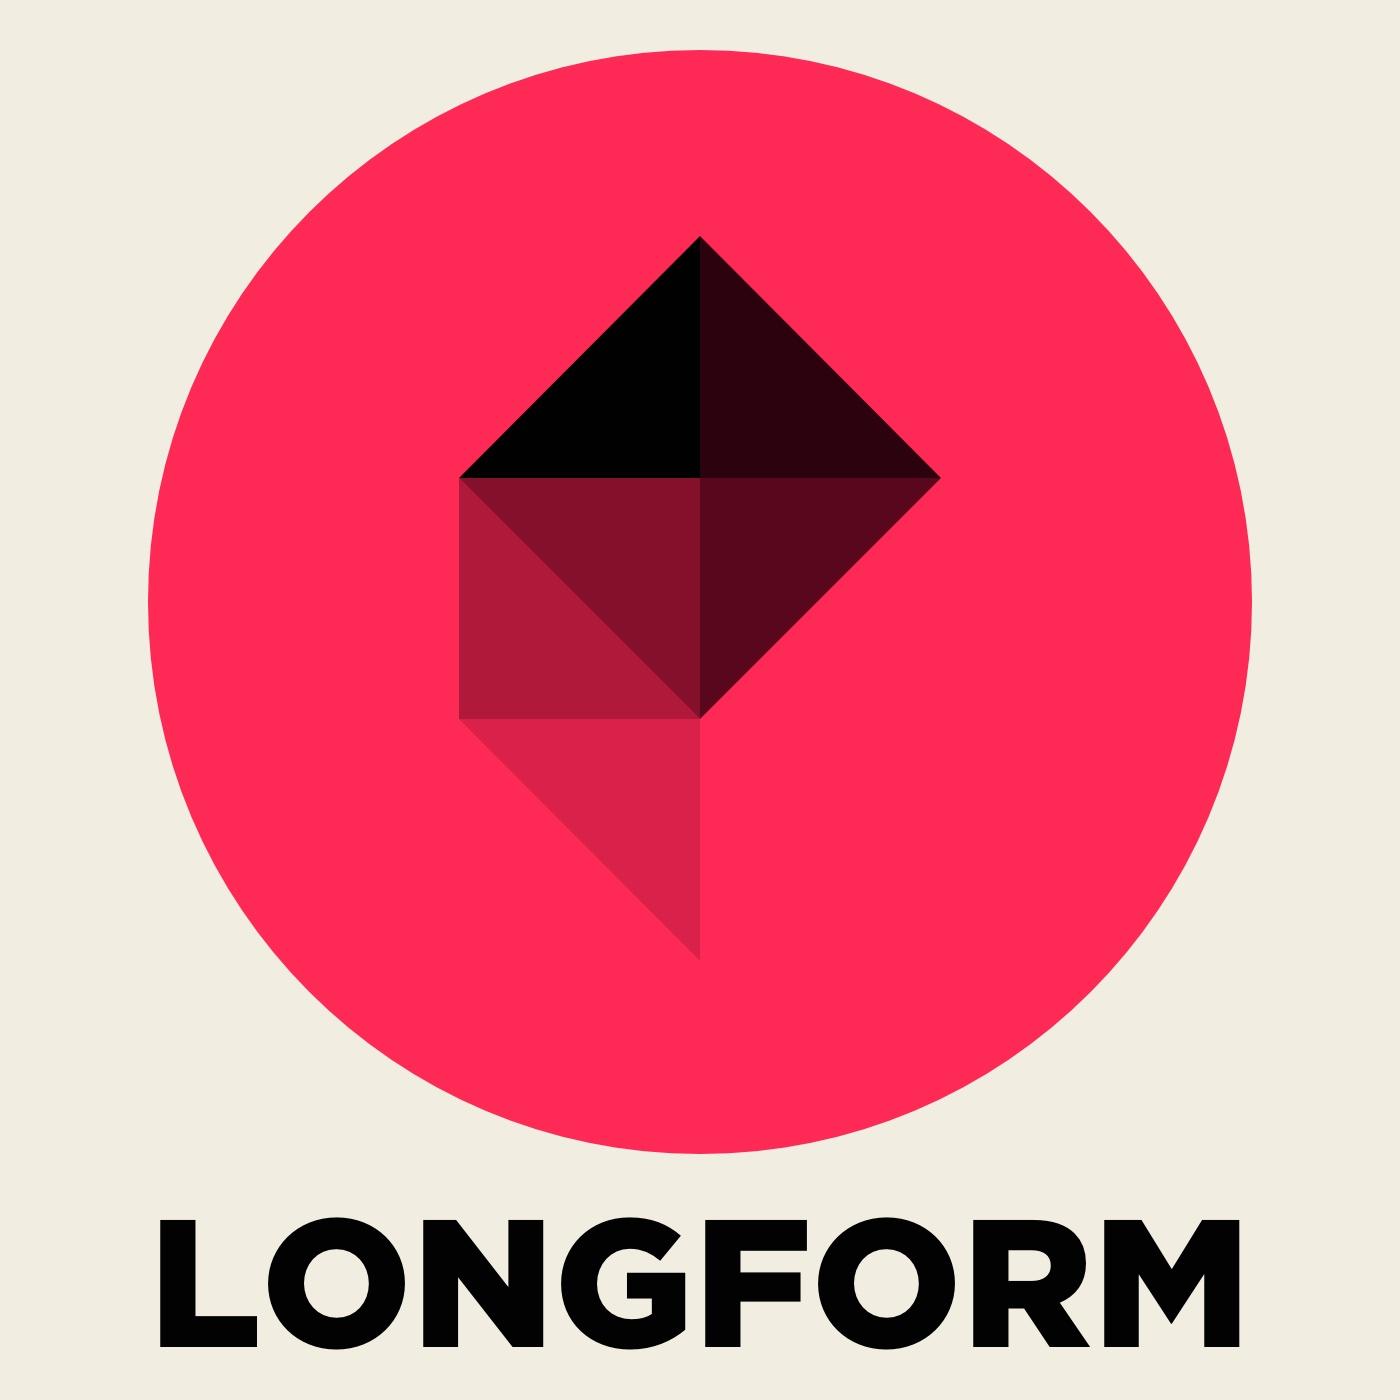 Polygon Longform